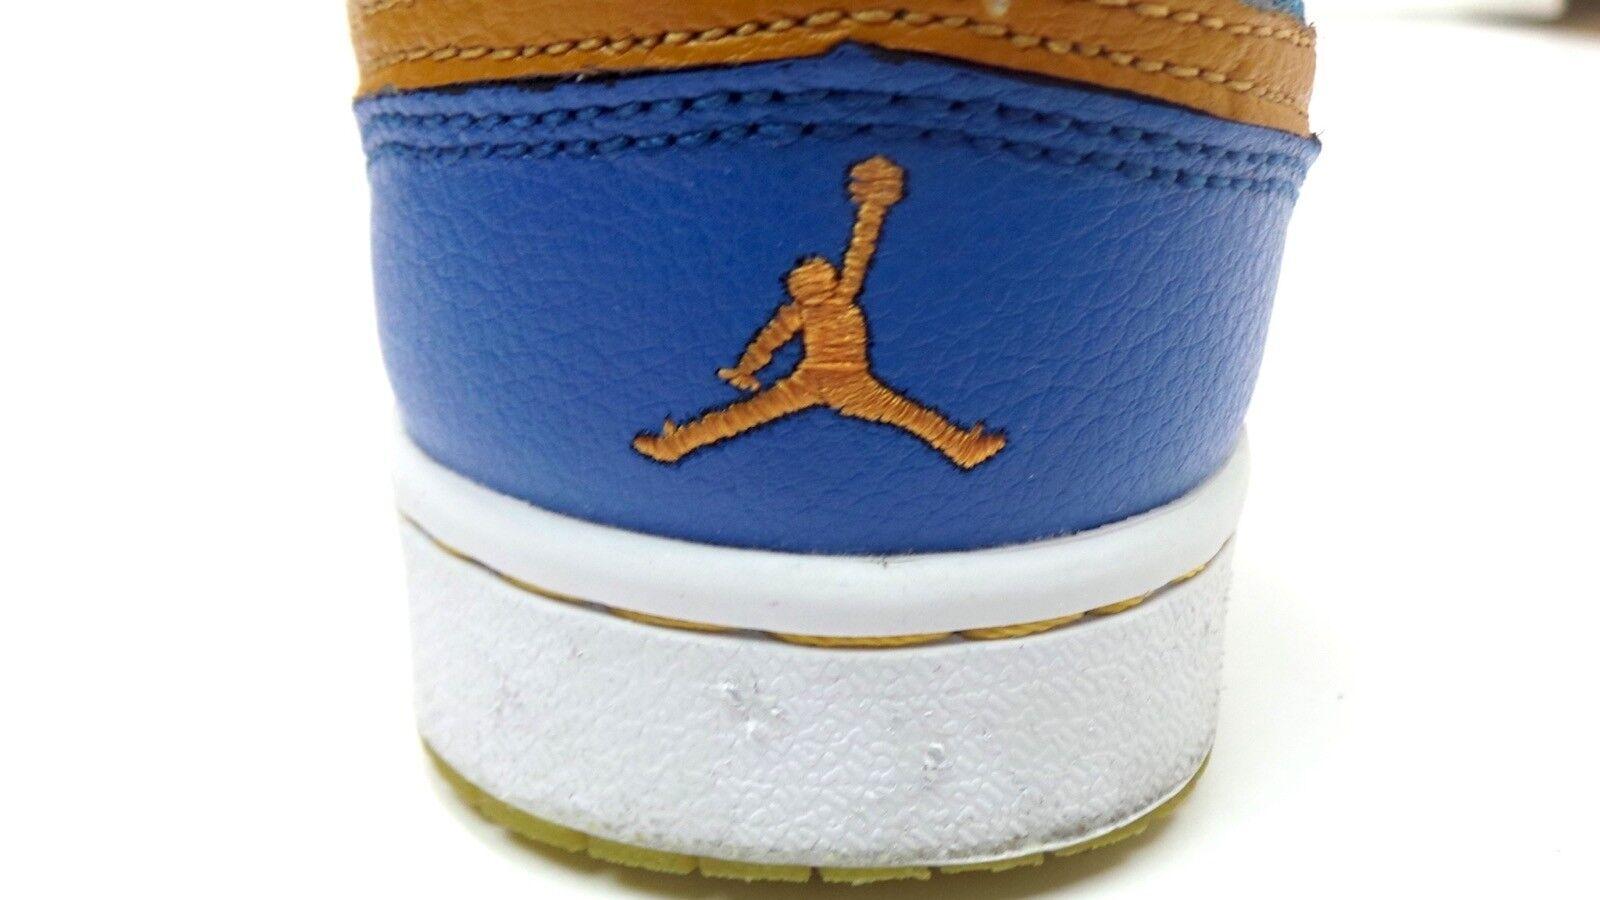 Nike Air Jordan Jordan Jordan 1 Phat SZ 2.5 Year Of The Dragon All Star  bluee 364770-403 603ca4